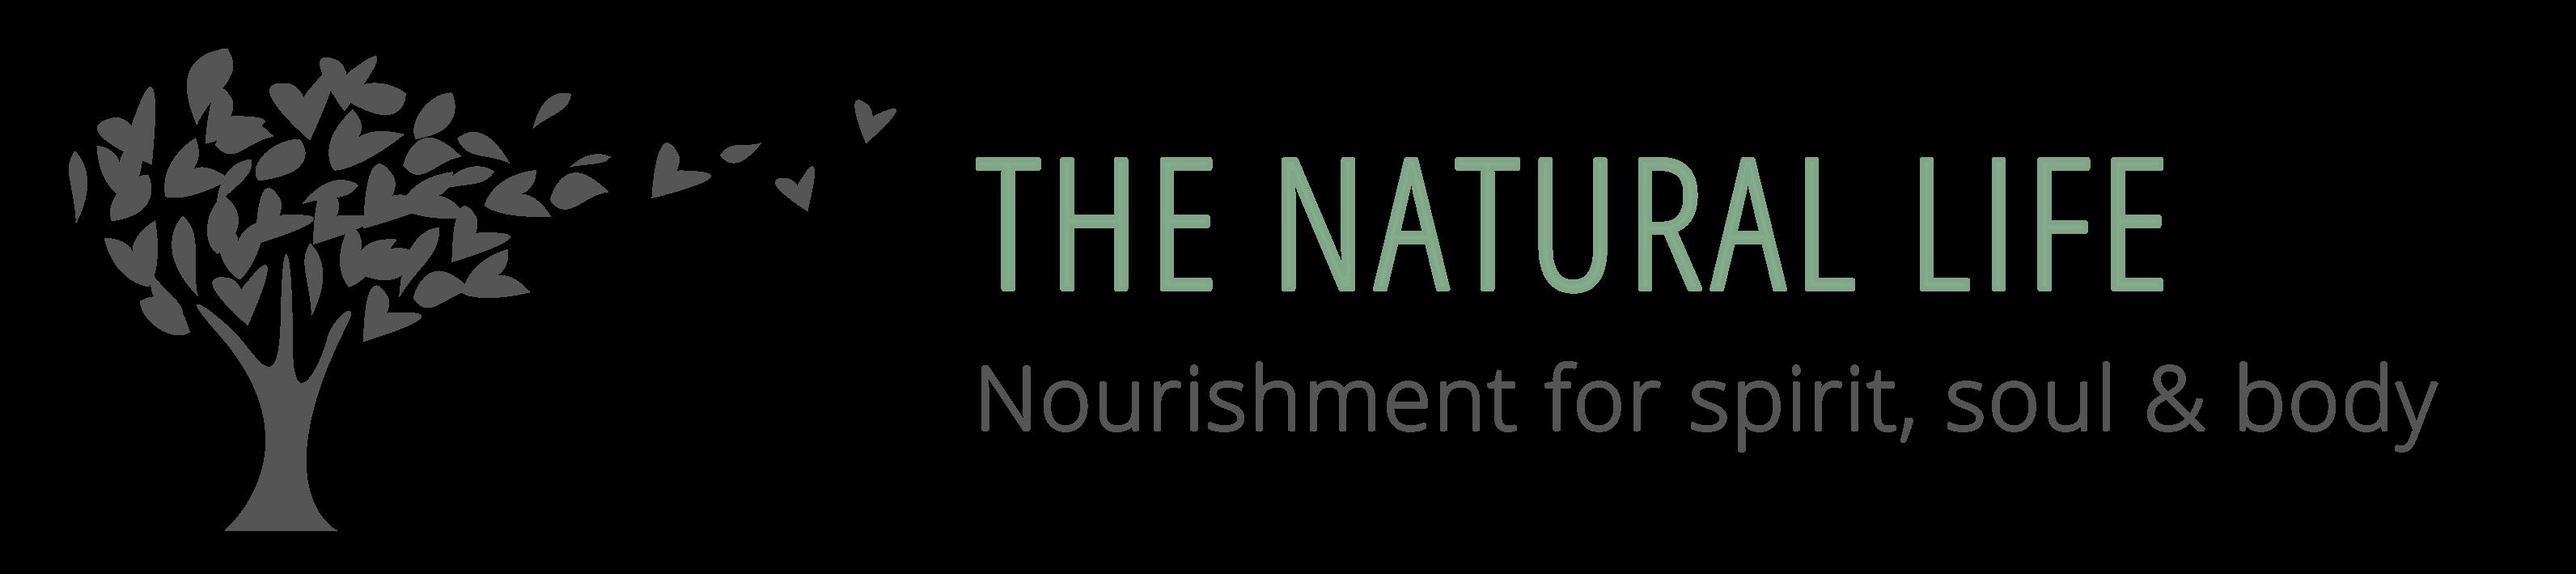 The Natural Life